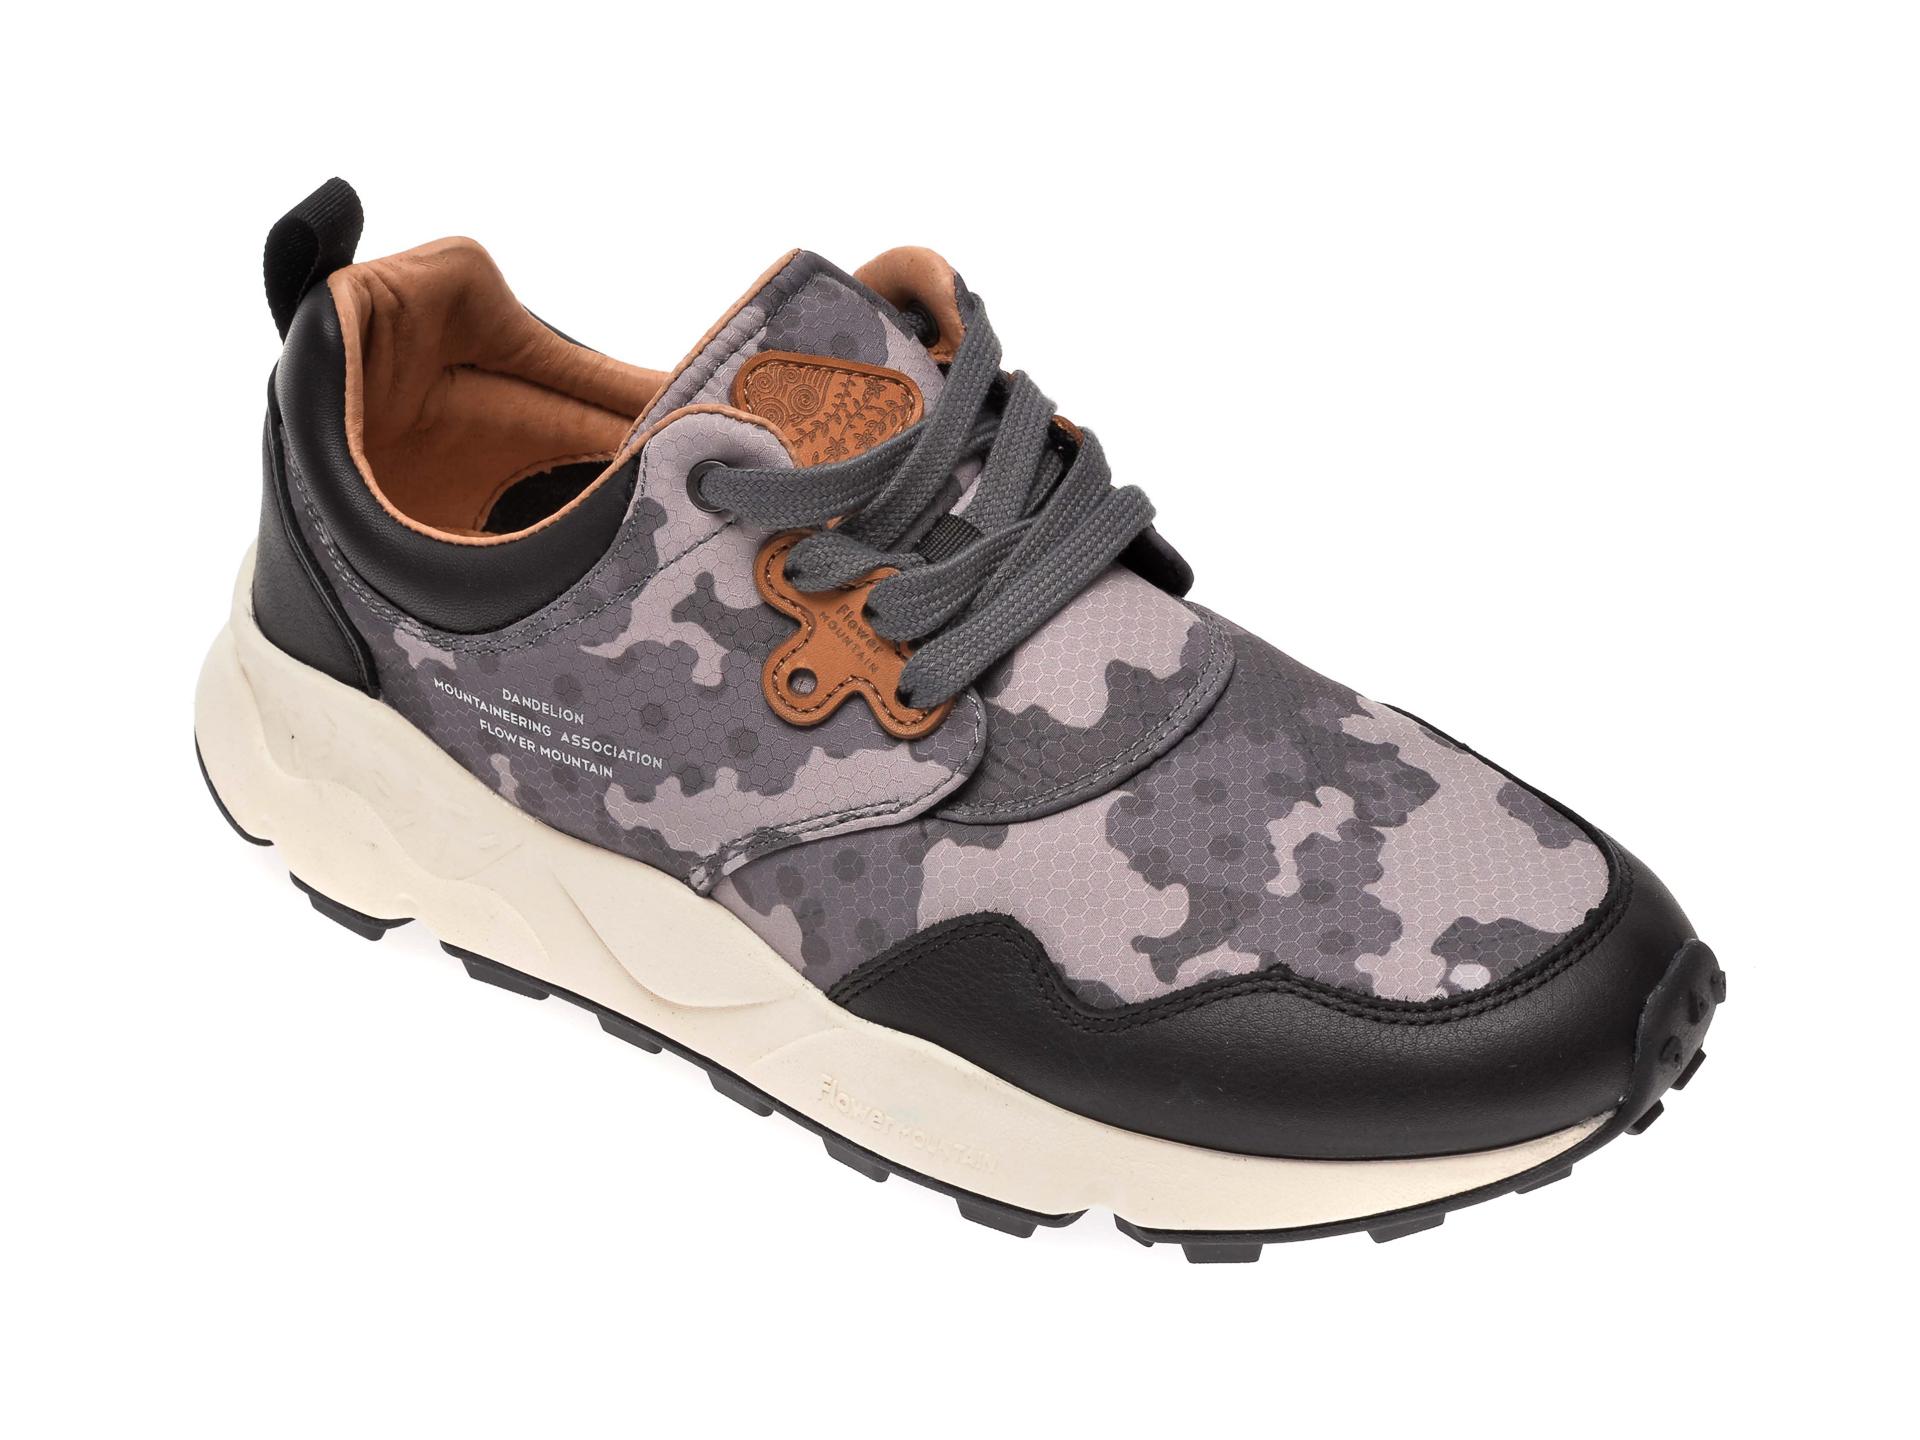 Pantofi sport FLOWER MOUNTAIN gri, 2014770, din material textil imagine